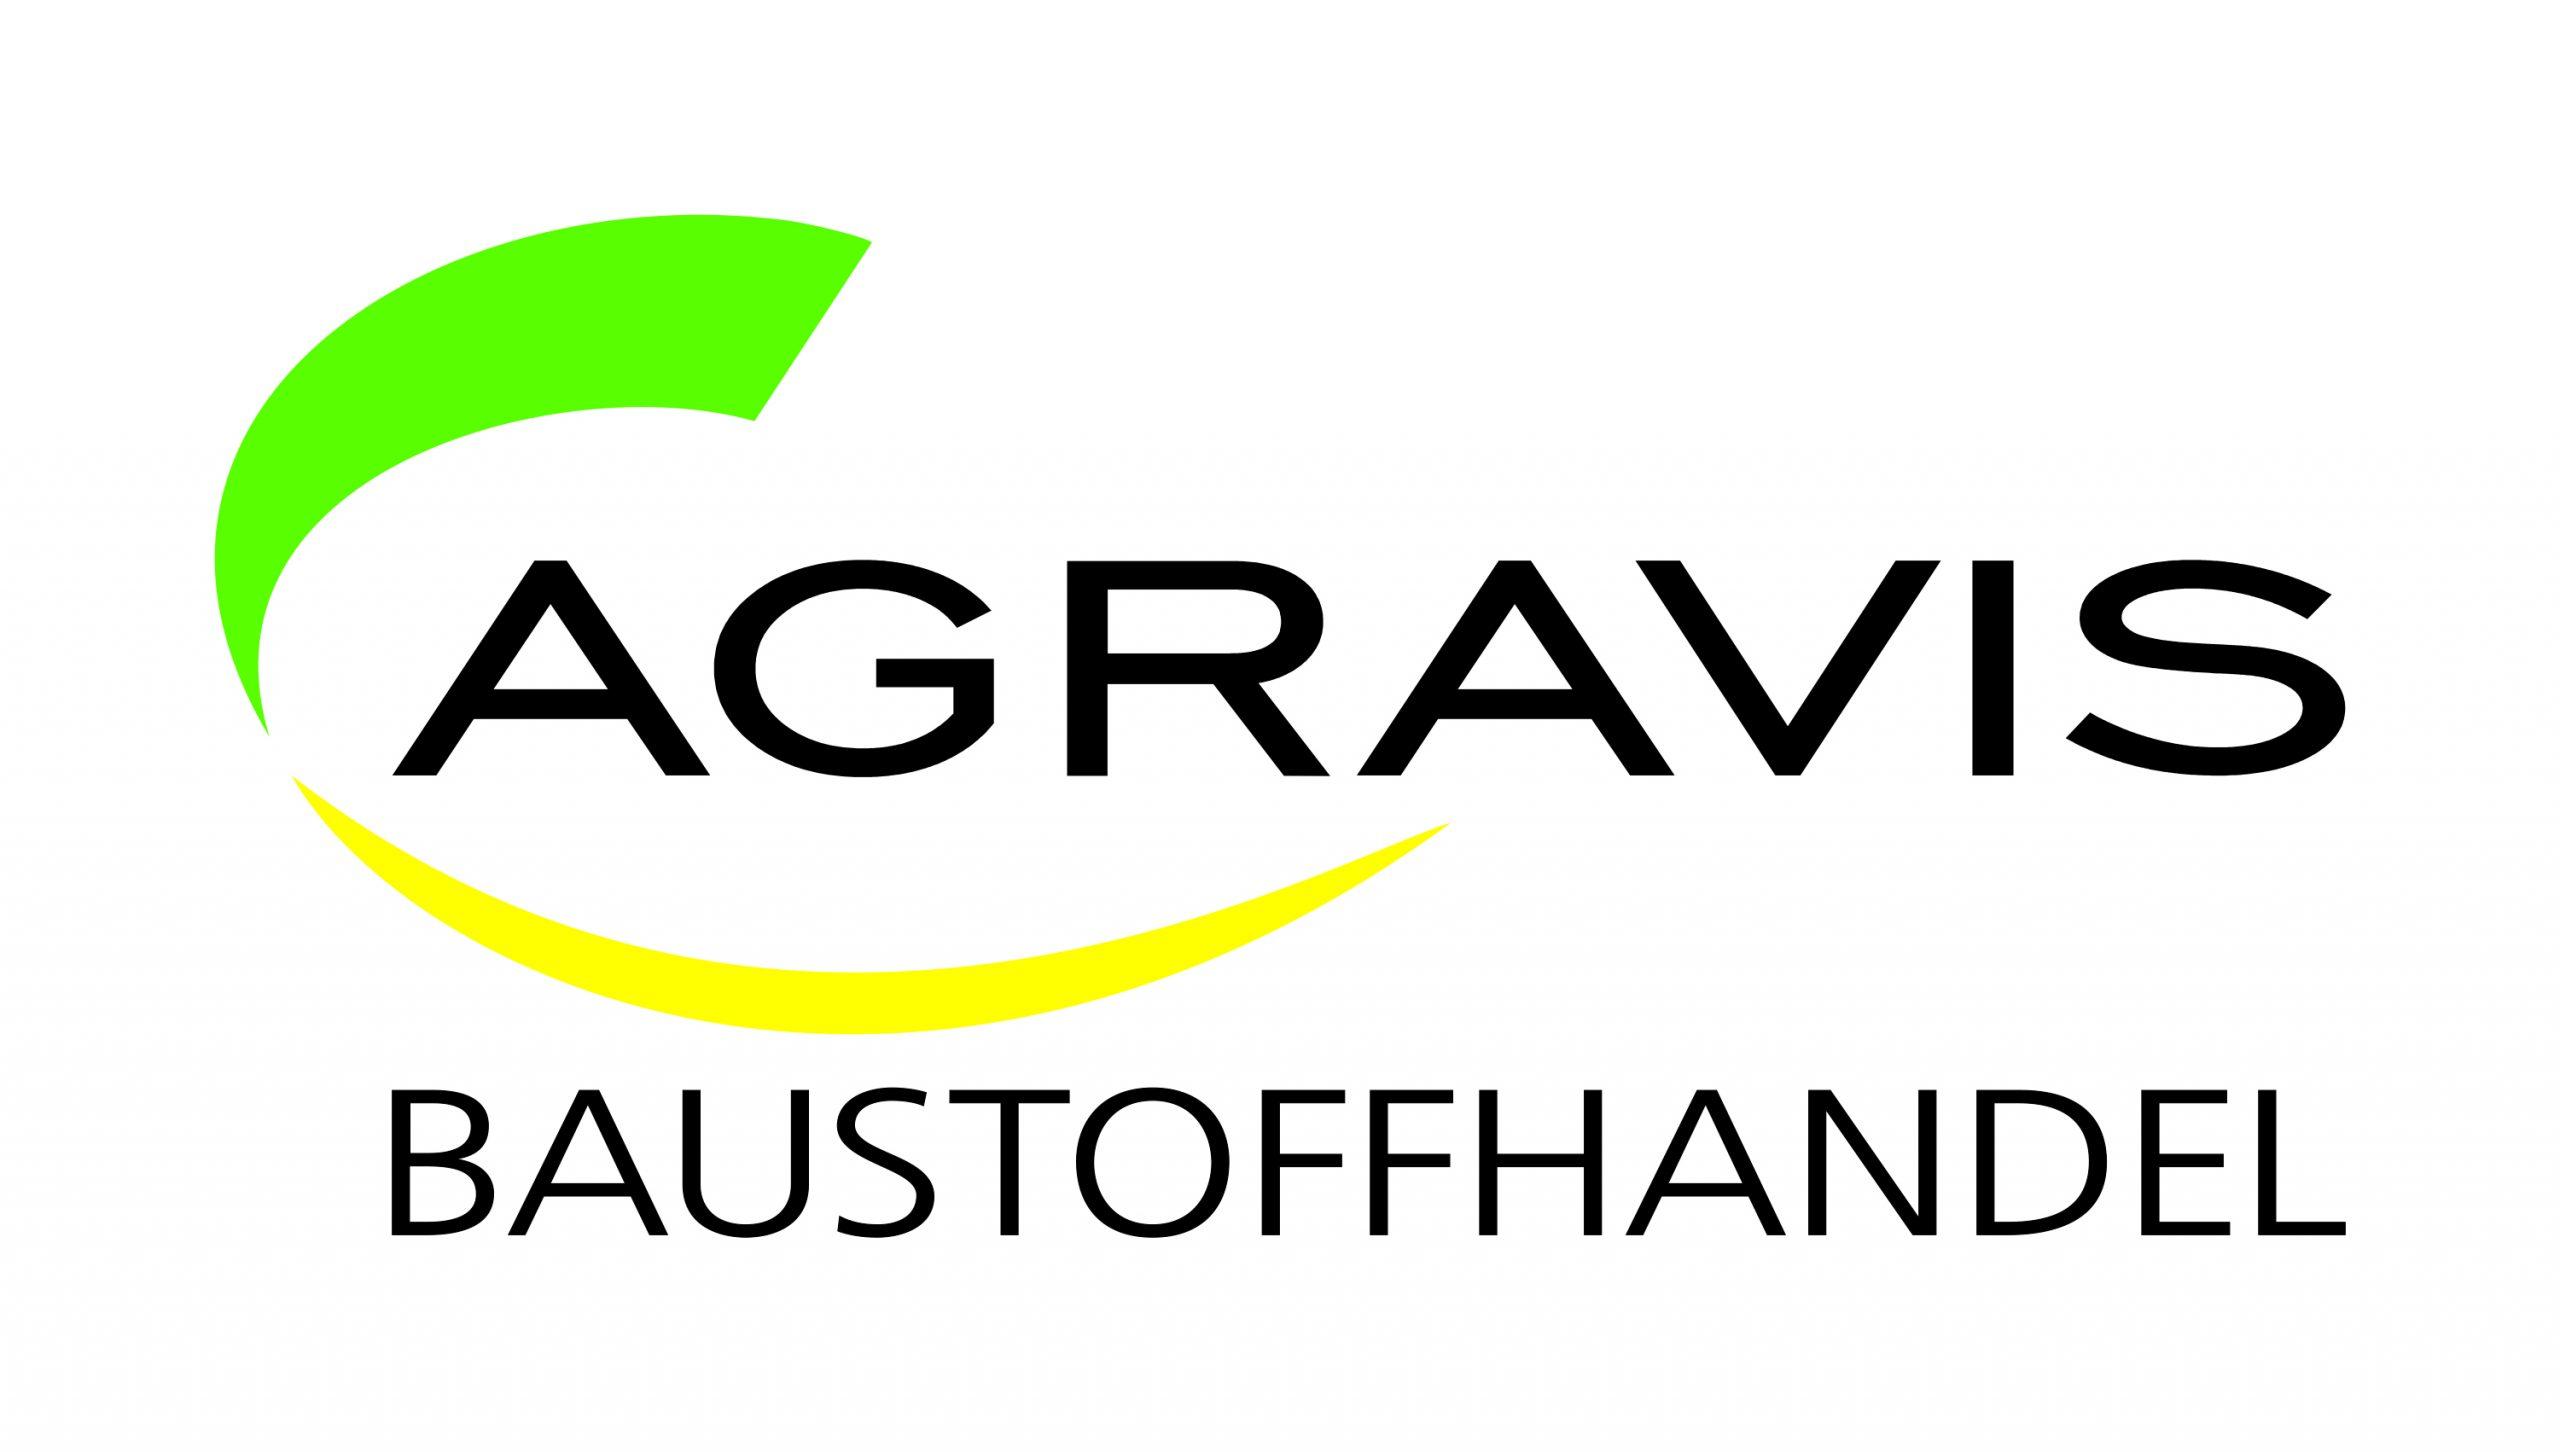 AGRAVIS Baustoffhandel GmbH